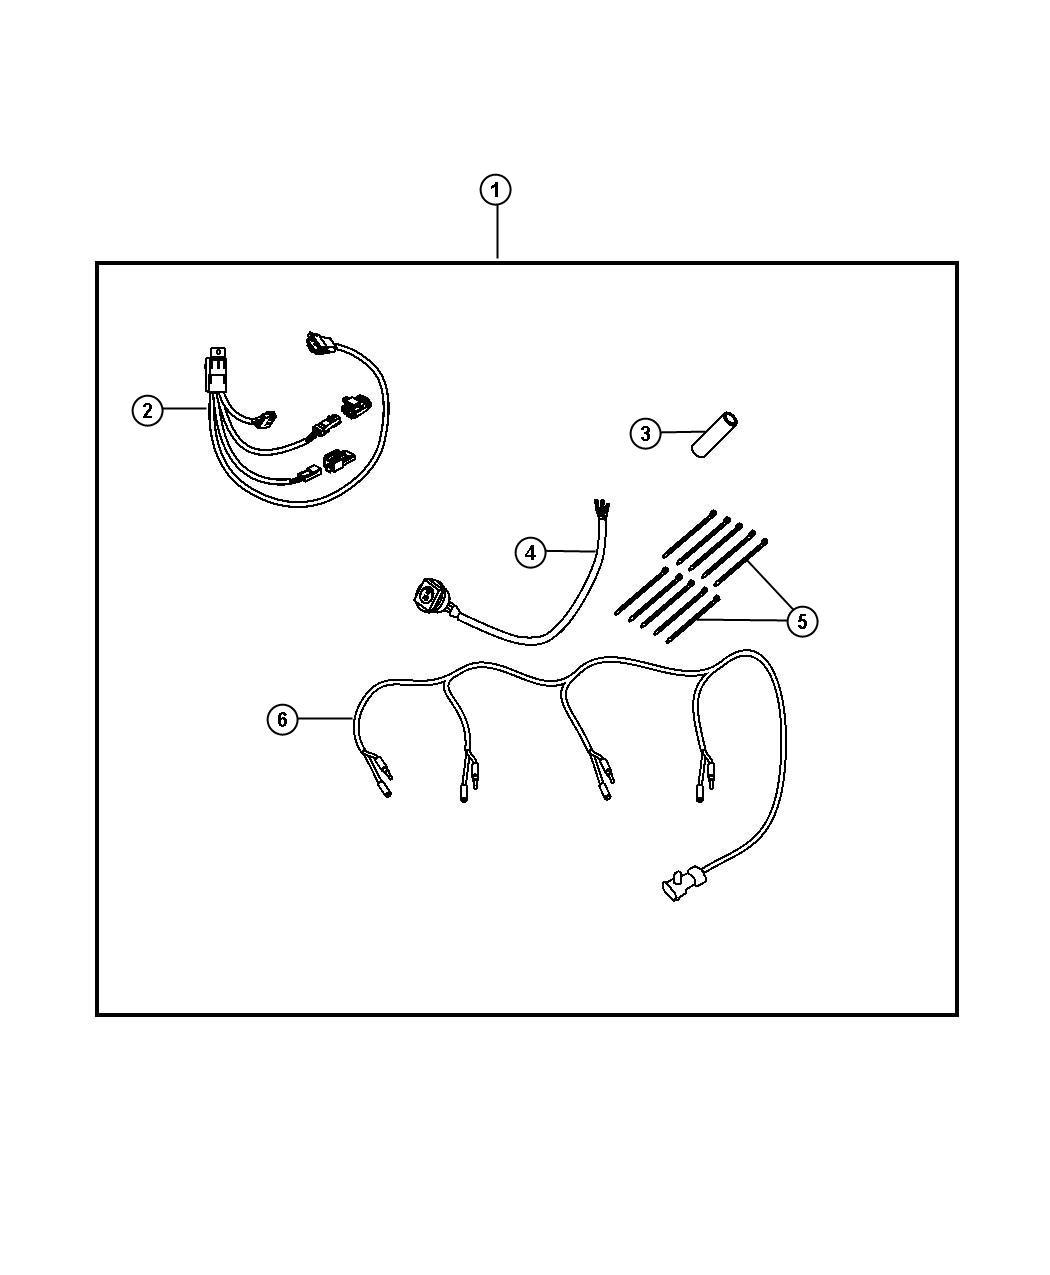 Dodge Nitro Harness. Wiring. Interior relay/switch harness